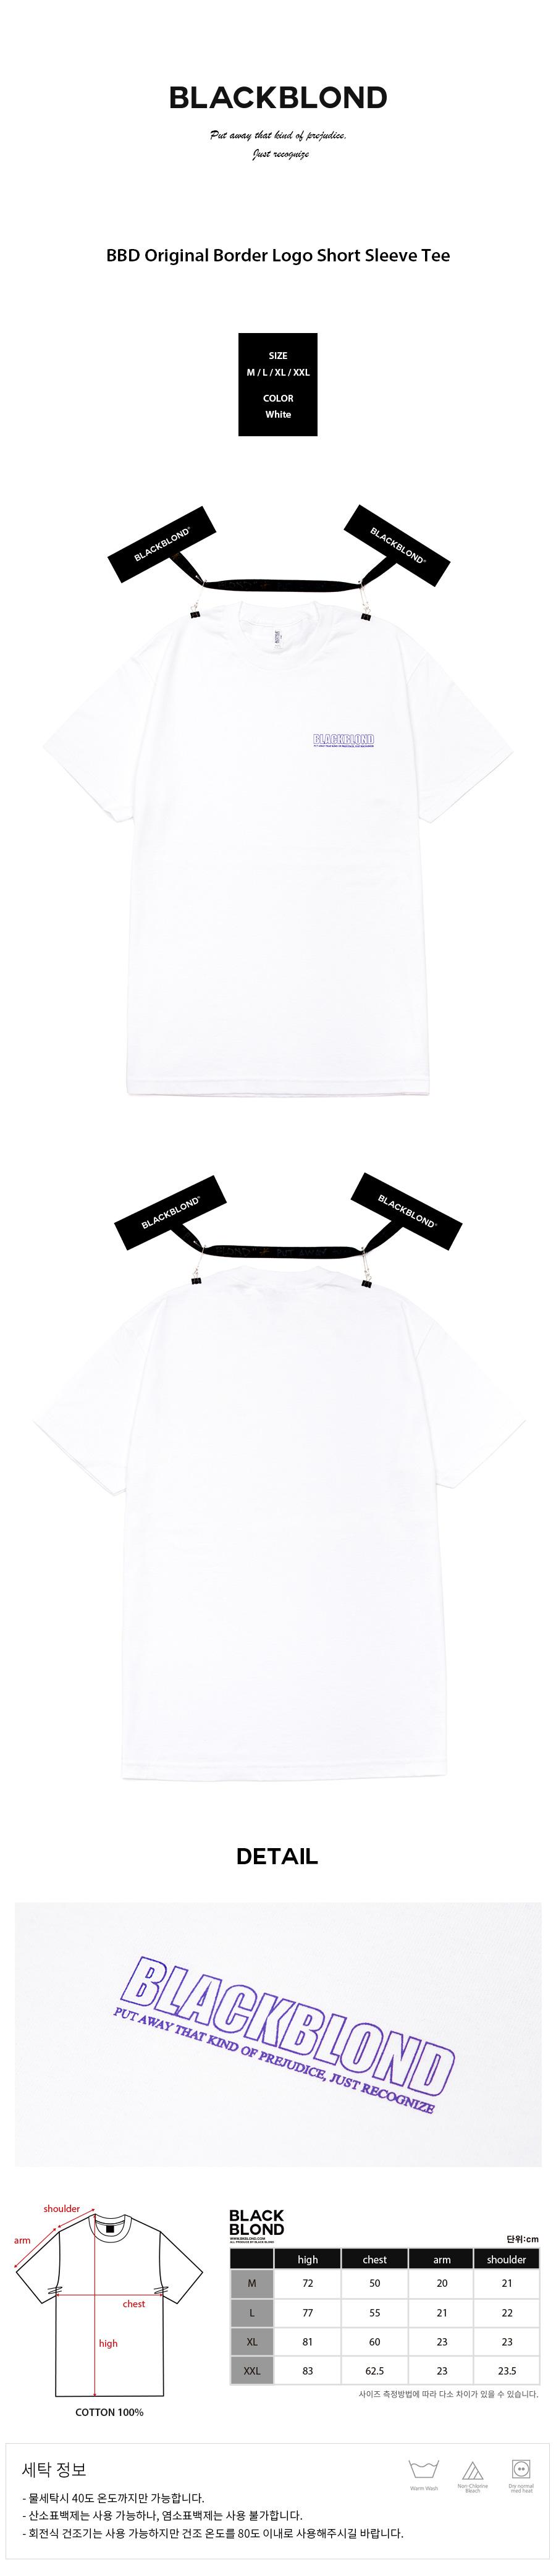 BLACKBLOND - BBD Original Border Logo Short Sleeve Tee (White)